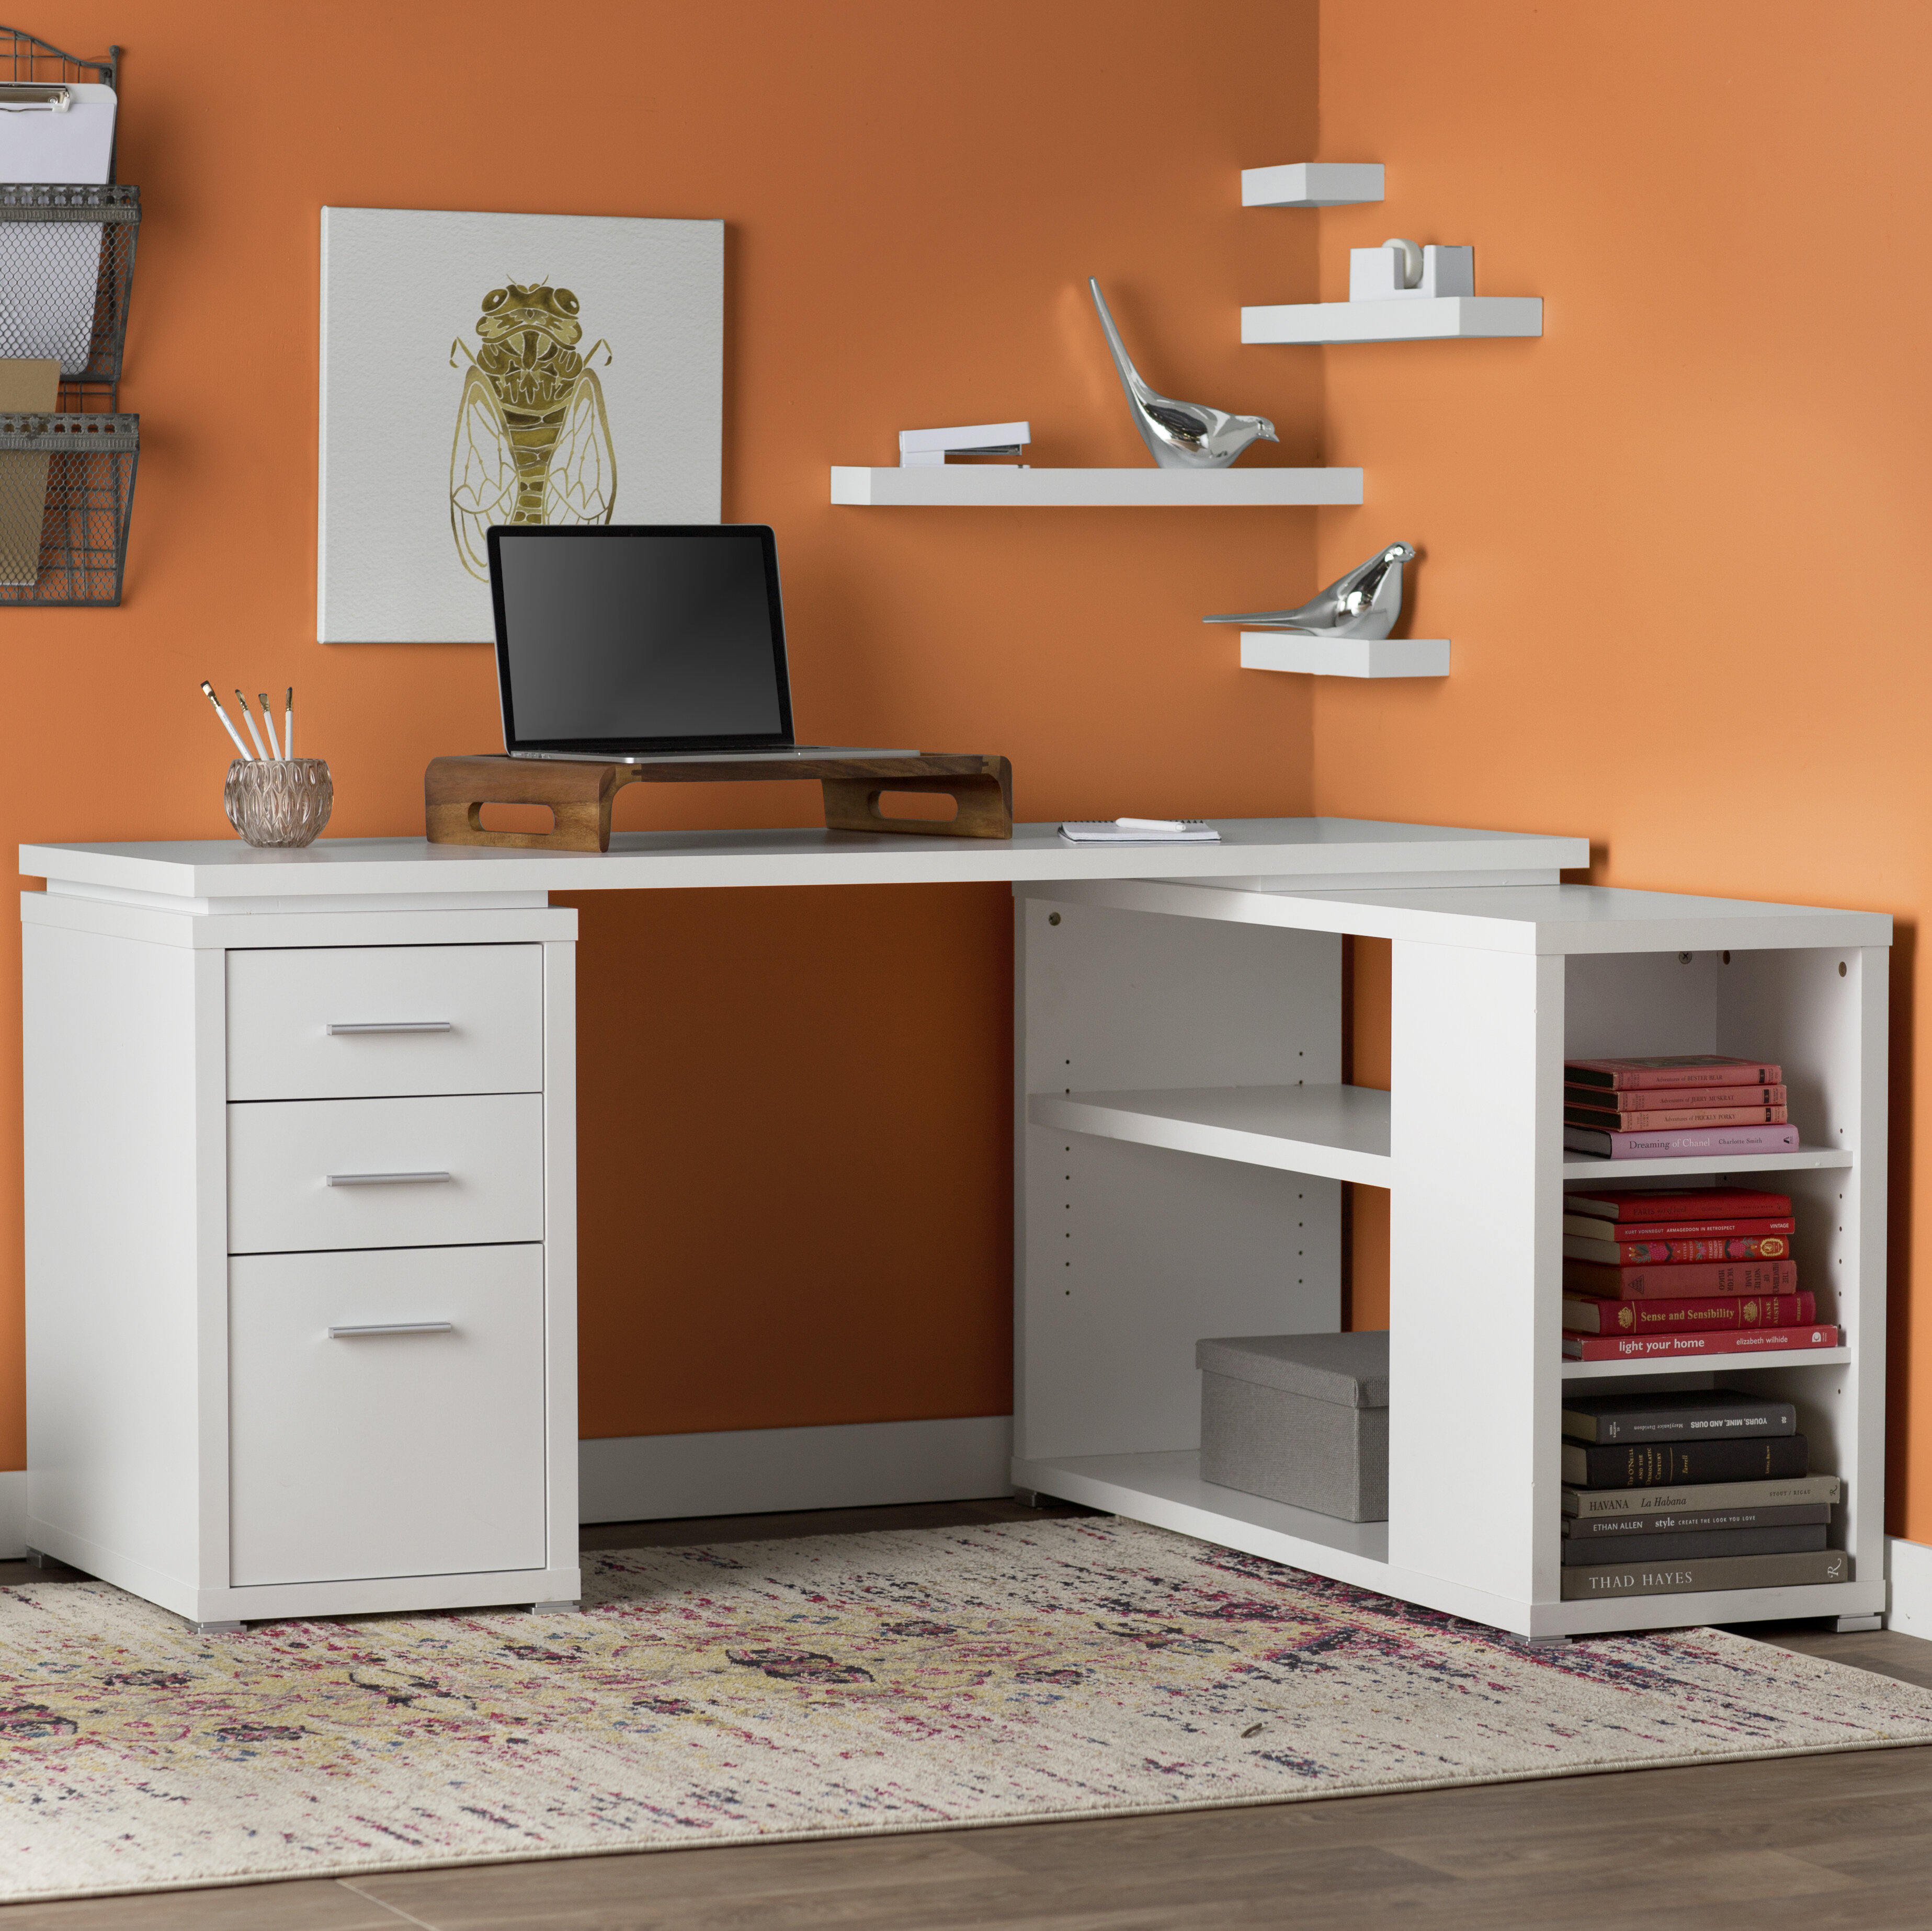 stories with cabinet drawer industrial filing pdx reviews kaj furniture wayfair desk vertical